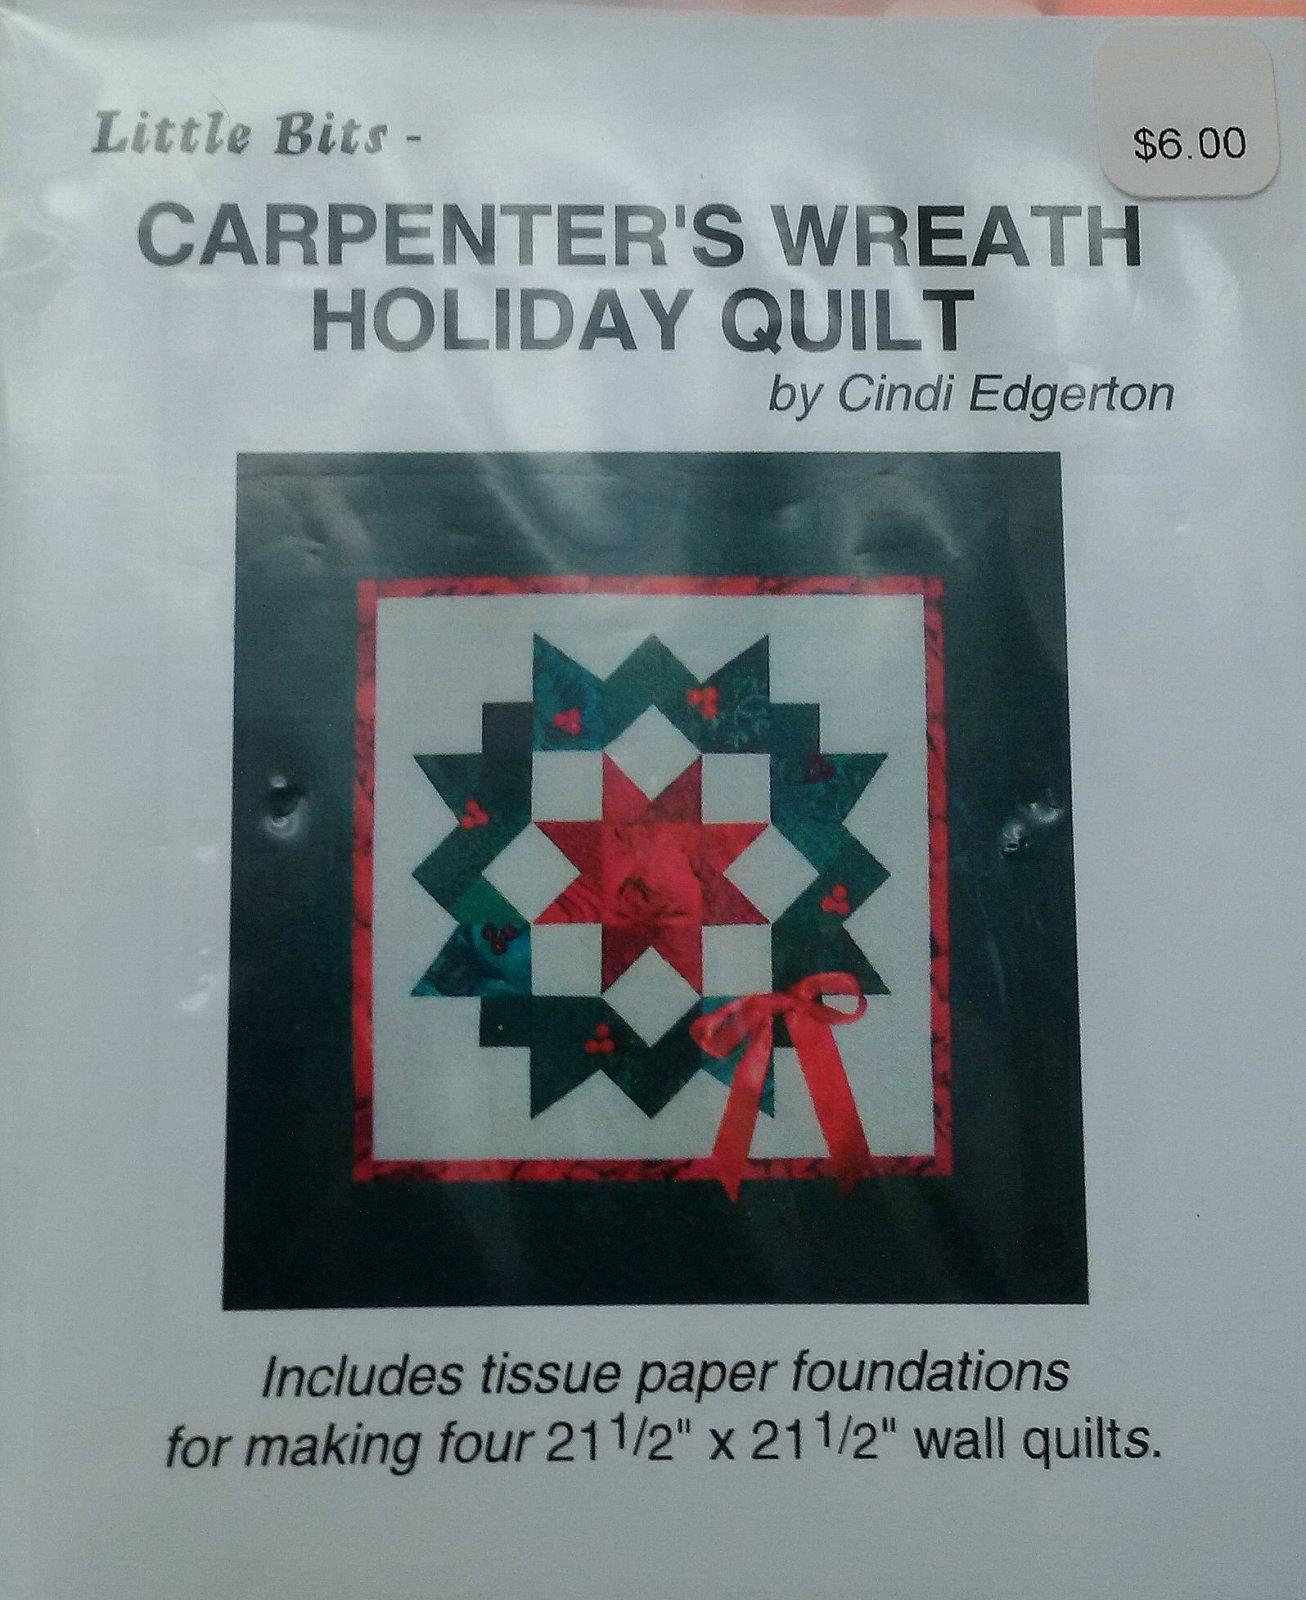 Little Bits Carpenter's Wreath Holiday Quilt Pattern